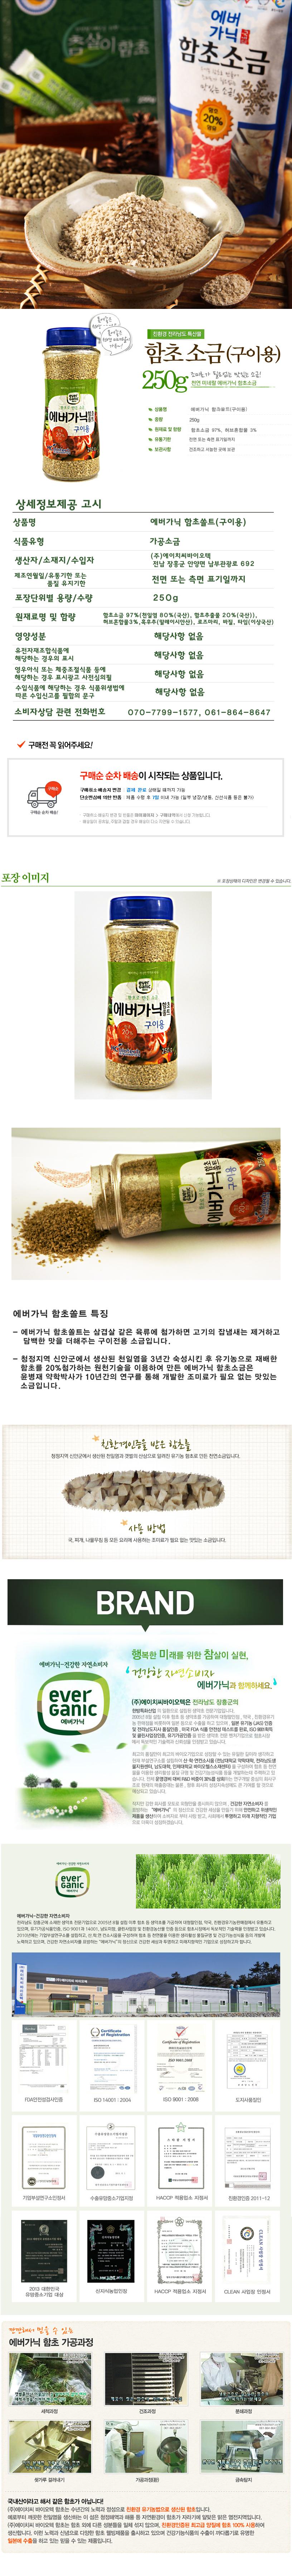 [ everganic ] Everganic Hamcho Salt (roasting)